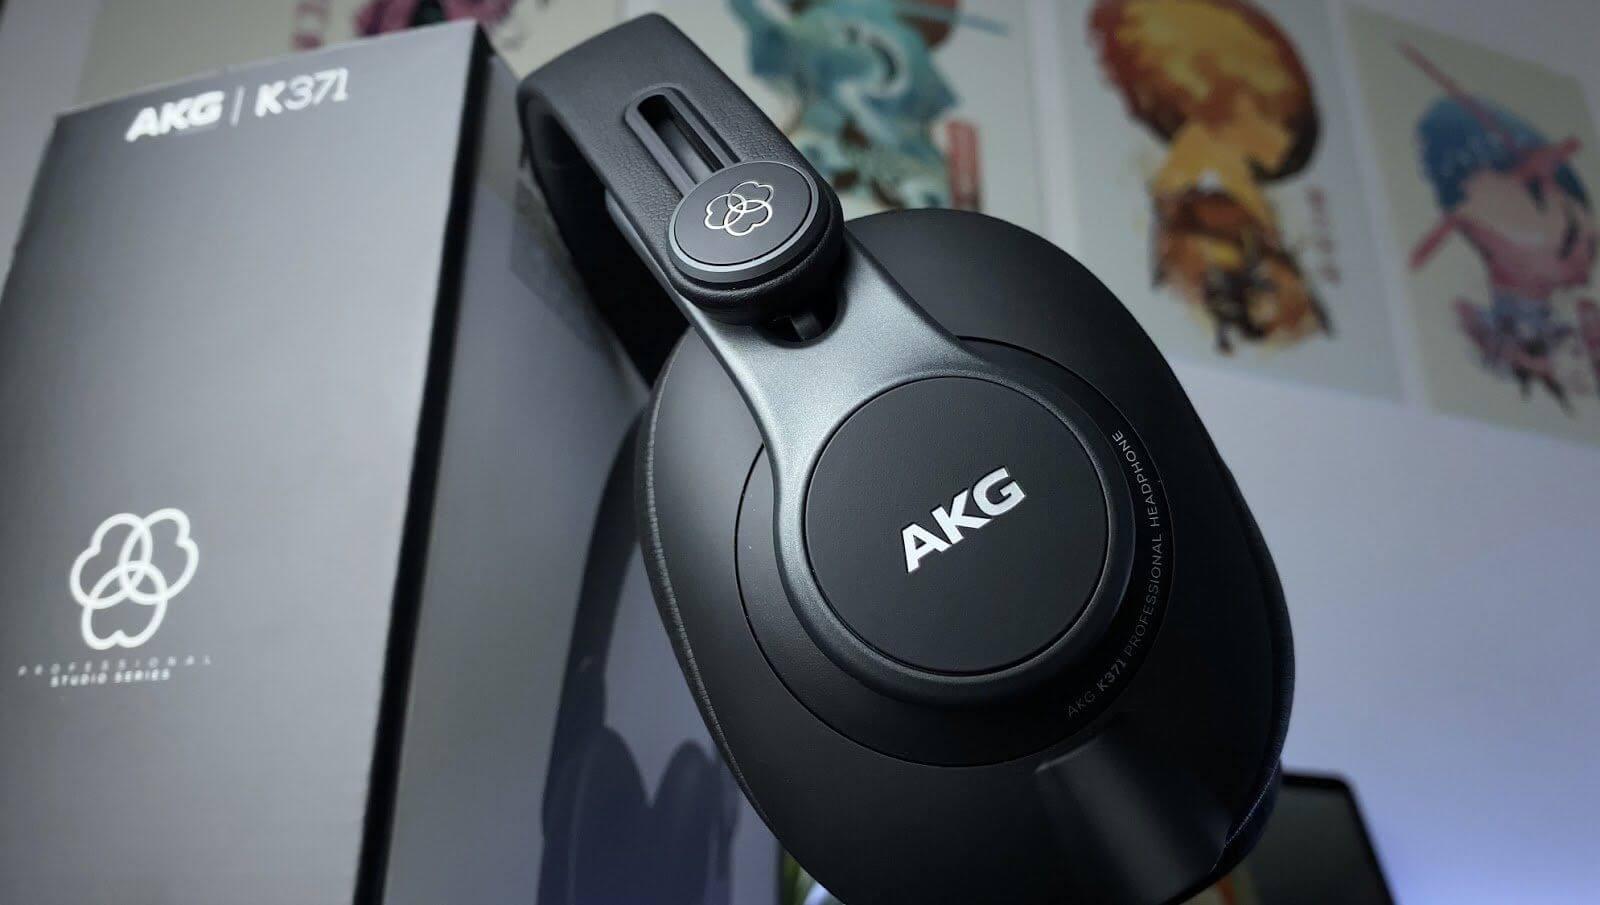 AKG K371 Review - Closed-back Benchmark Headphone